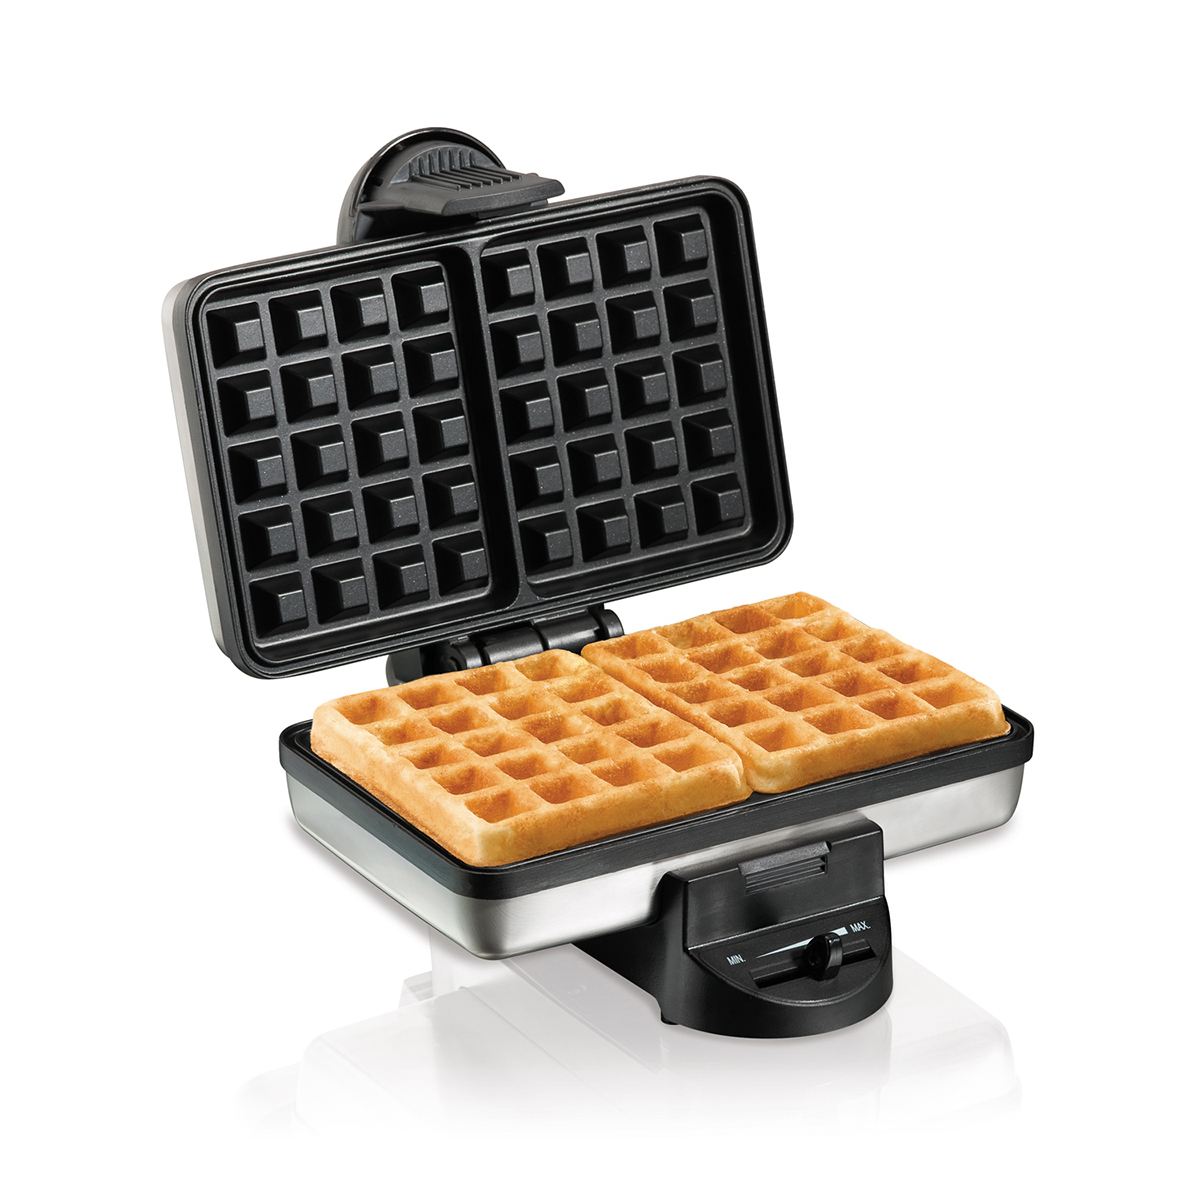 Hamilton Beach 26009 Stainless Steel Belgian-Style Square Waffle Maker - CBS BAHAMAS LTD